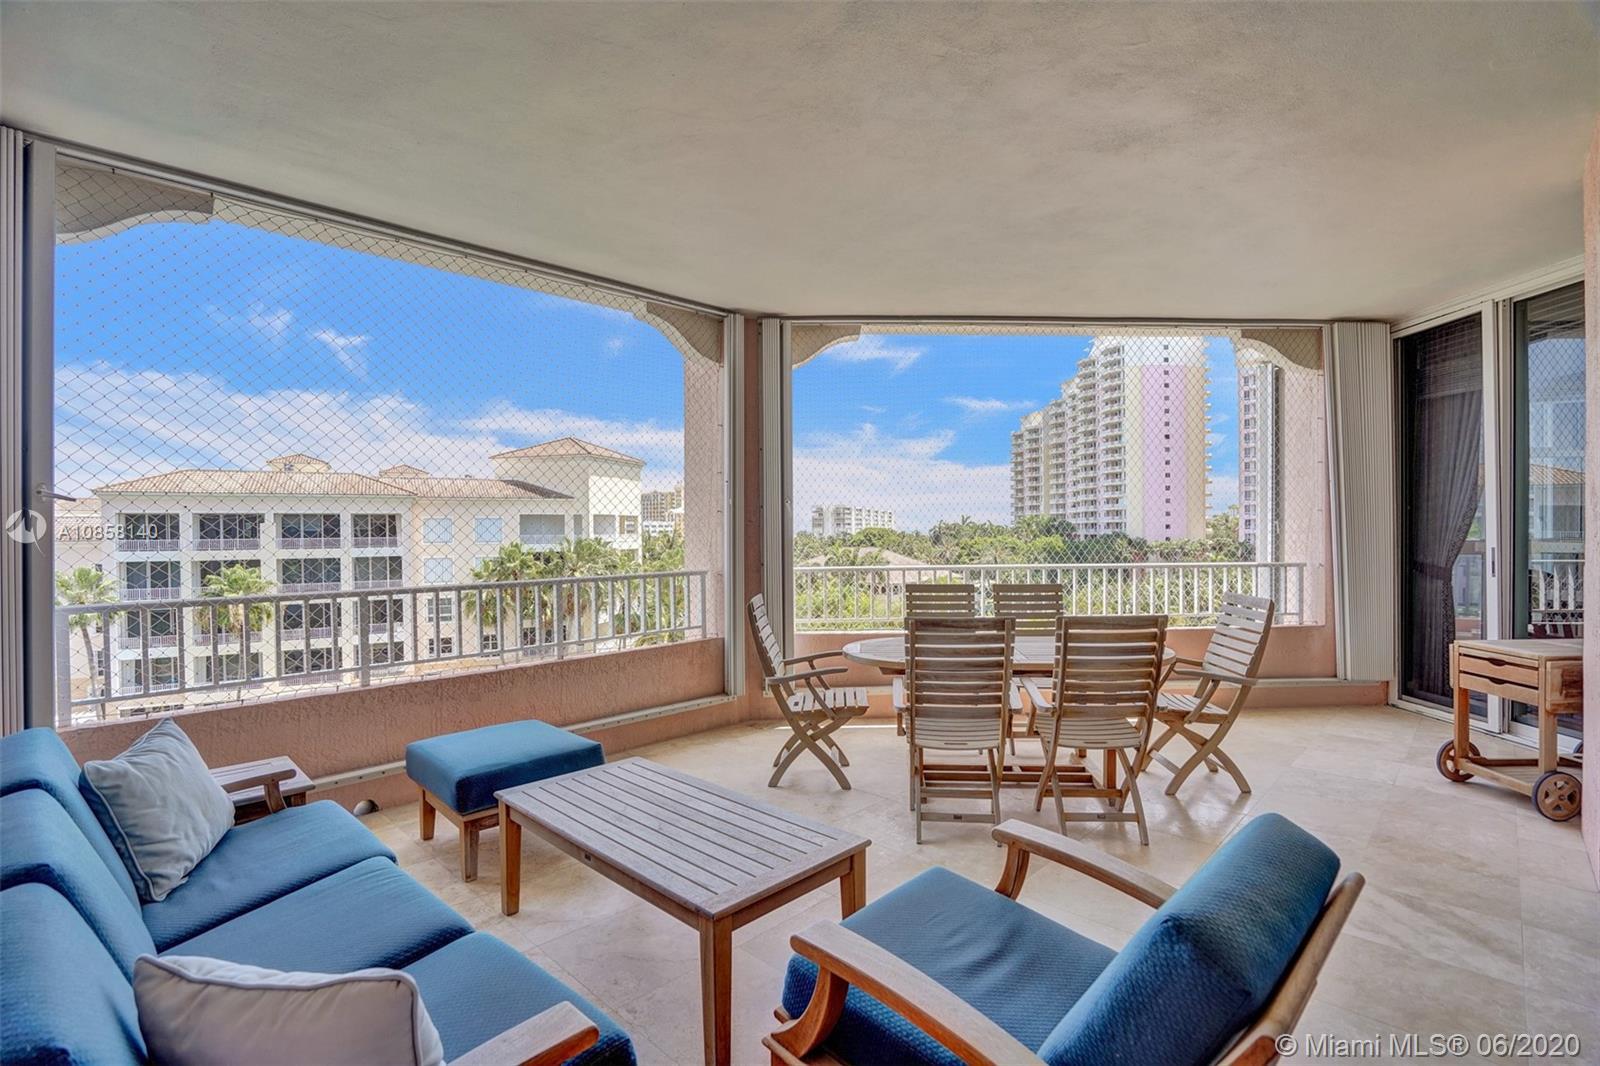 739 Crandon Blvd, Key Biscayne, Florida 33149, 4 Bedrooms Bedrooms, ,4 BathroomsBathrooms,Residential,For Sale,739 Crandon Blvd,A10858140